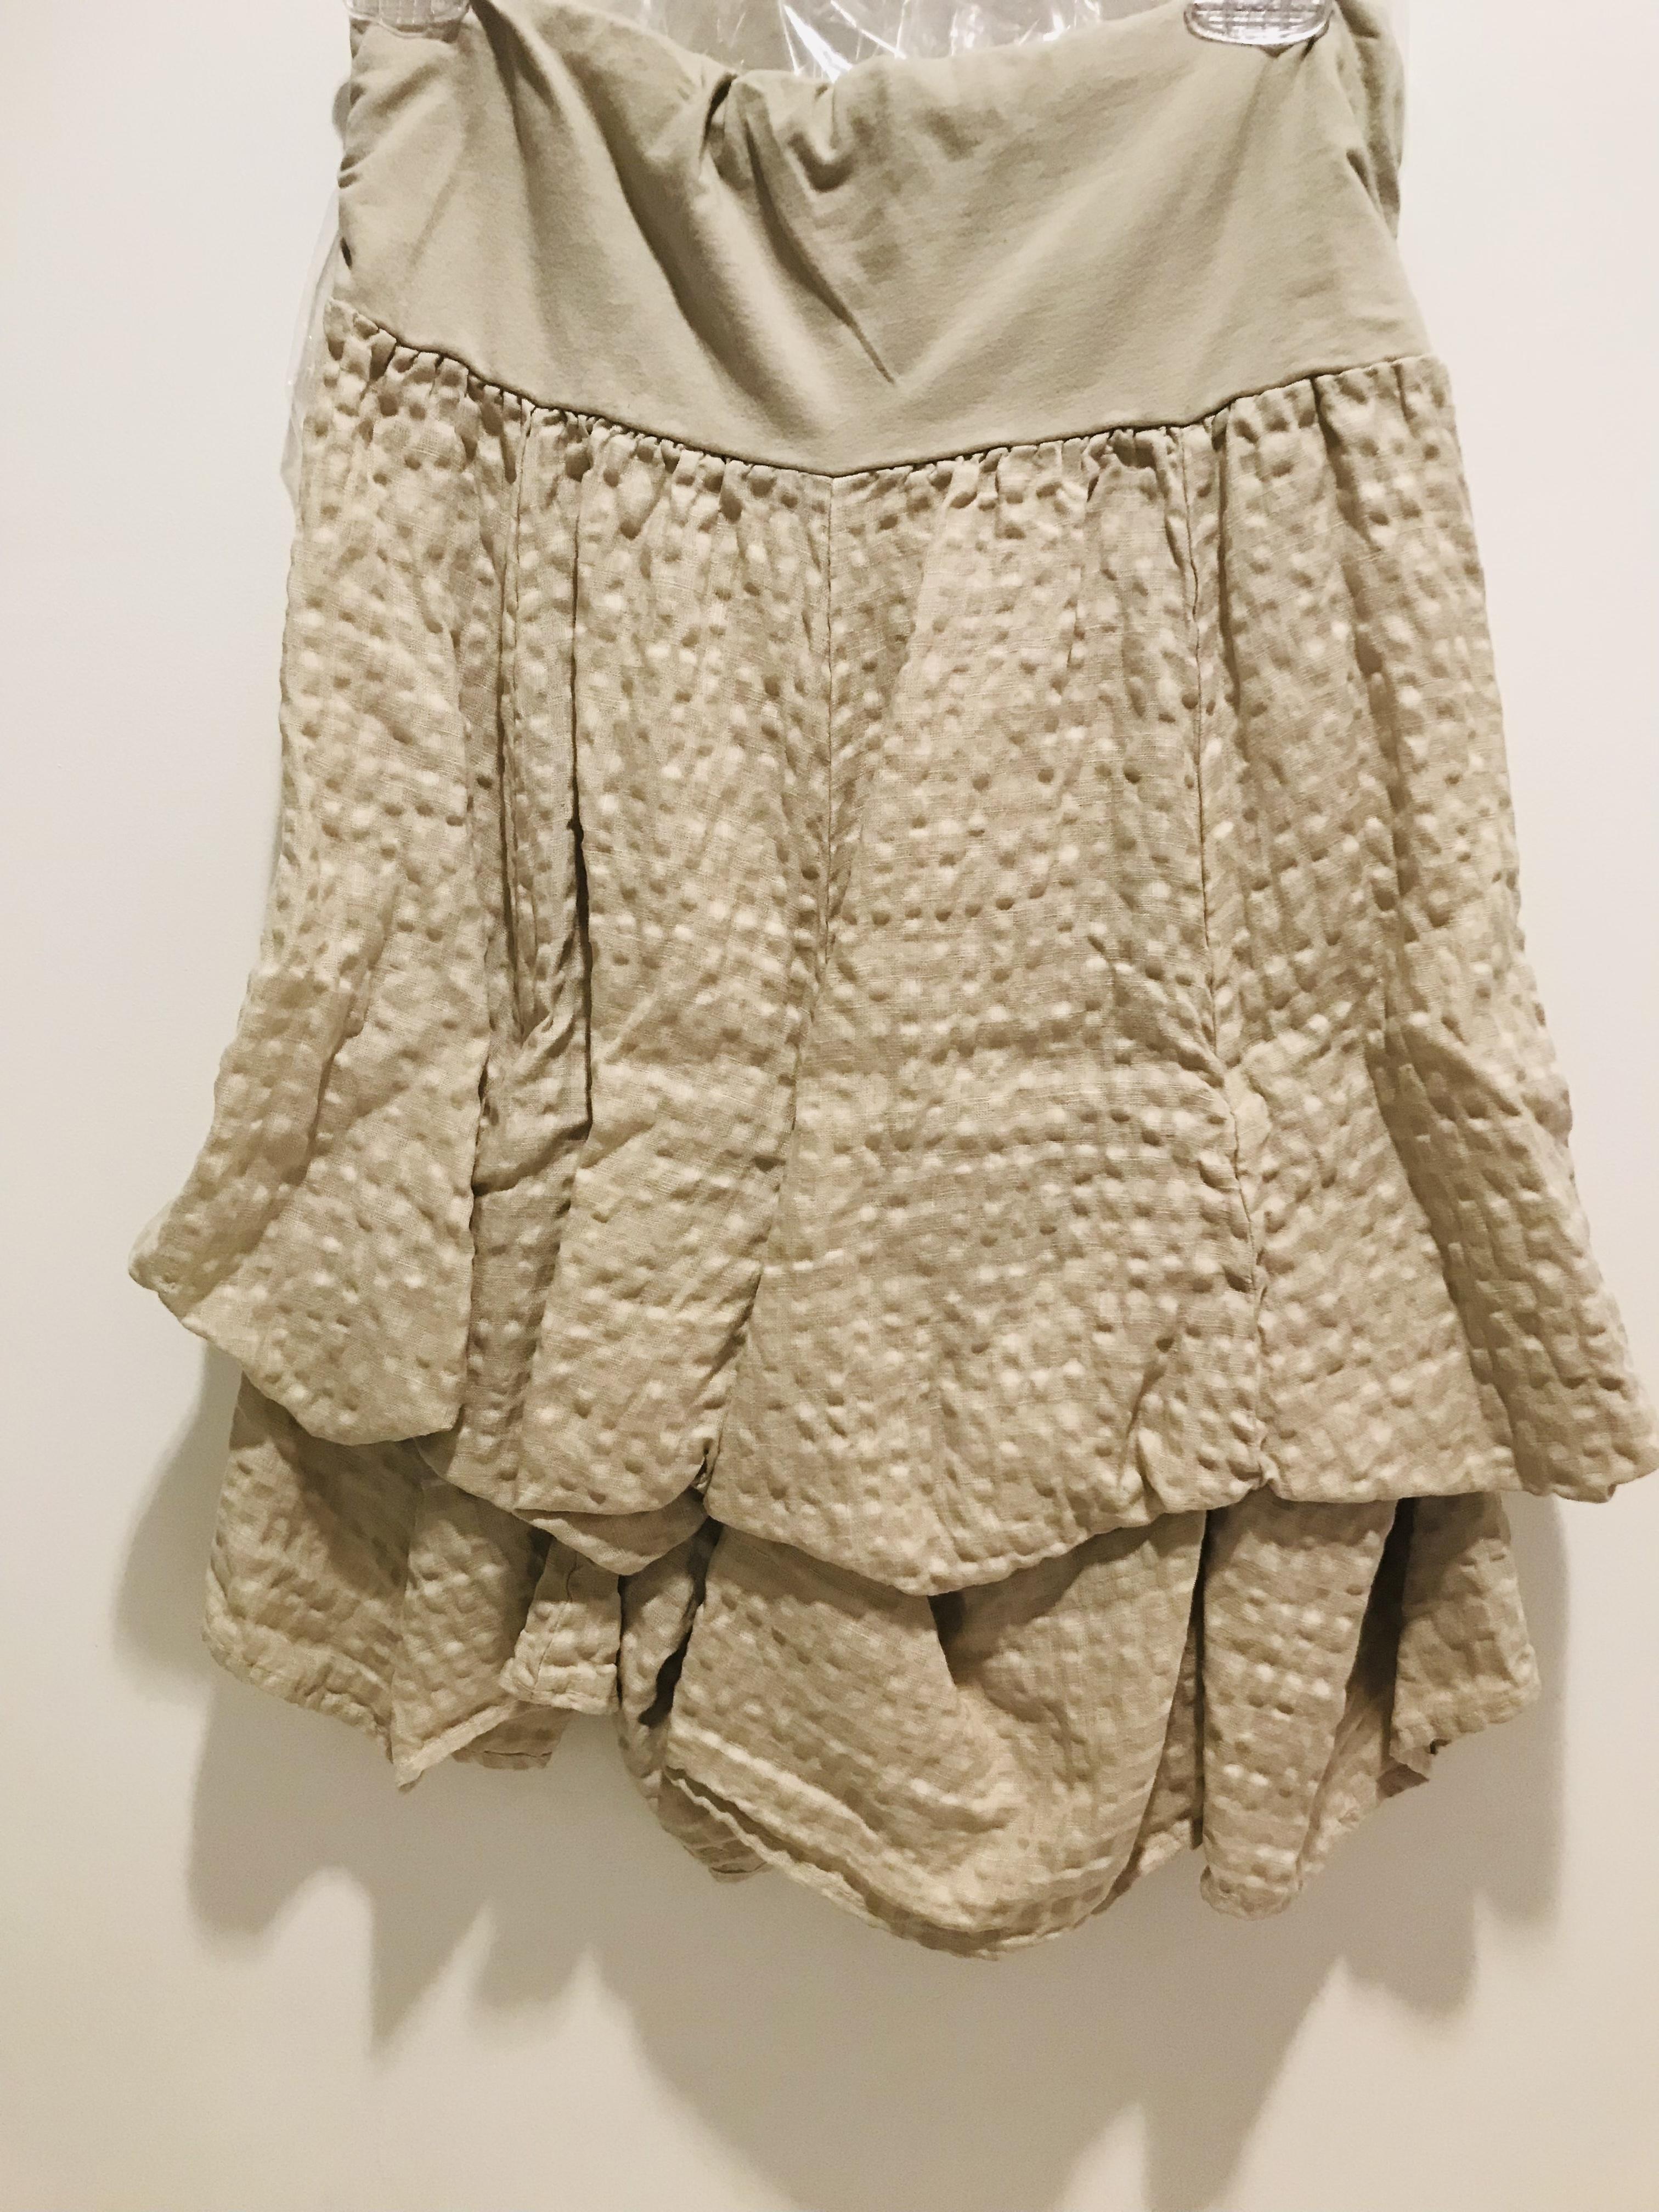 Luna Luz: Tied & Dyed Seersucker Cotton Skirt (In Khaki, Ships Immed!) LL_S501_KHAKI